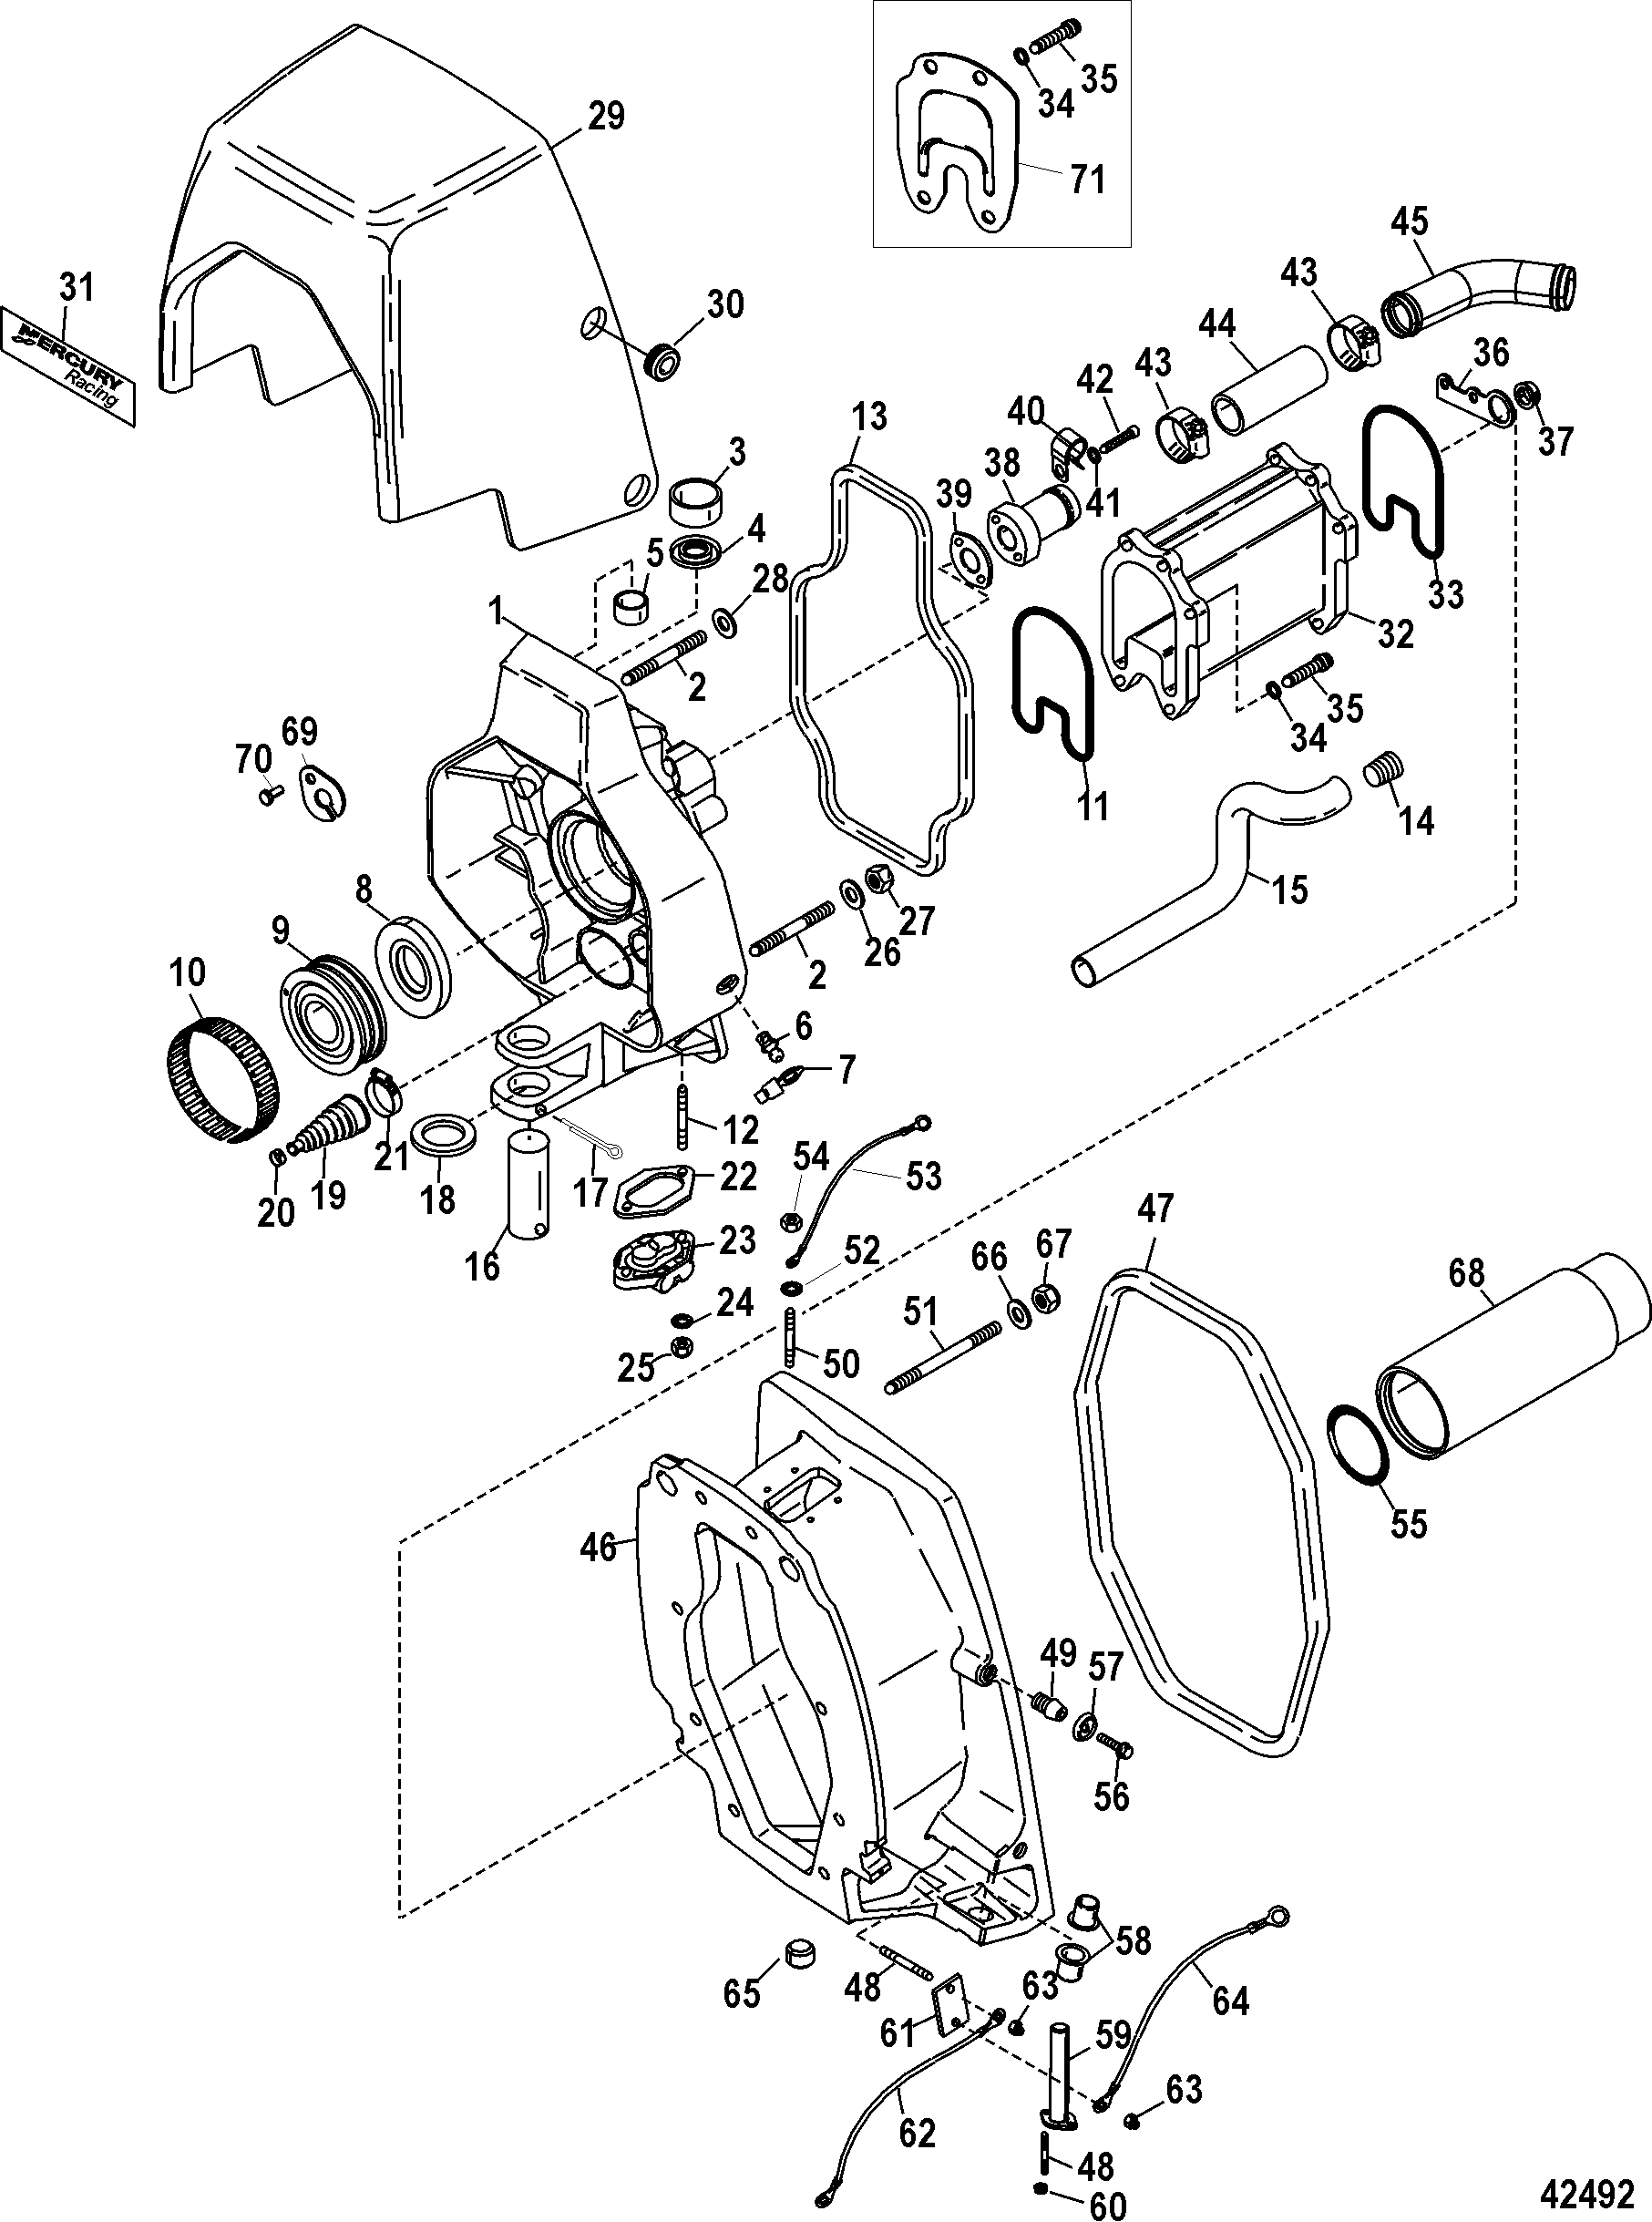 Mercruiser Integrated Transom 0m052768 1994 Evinrude 175 Wiring Diagrams Gimbal Housingintegrated